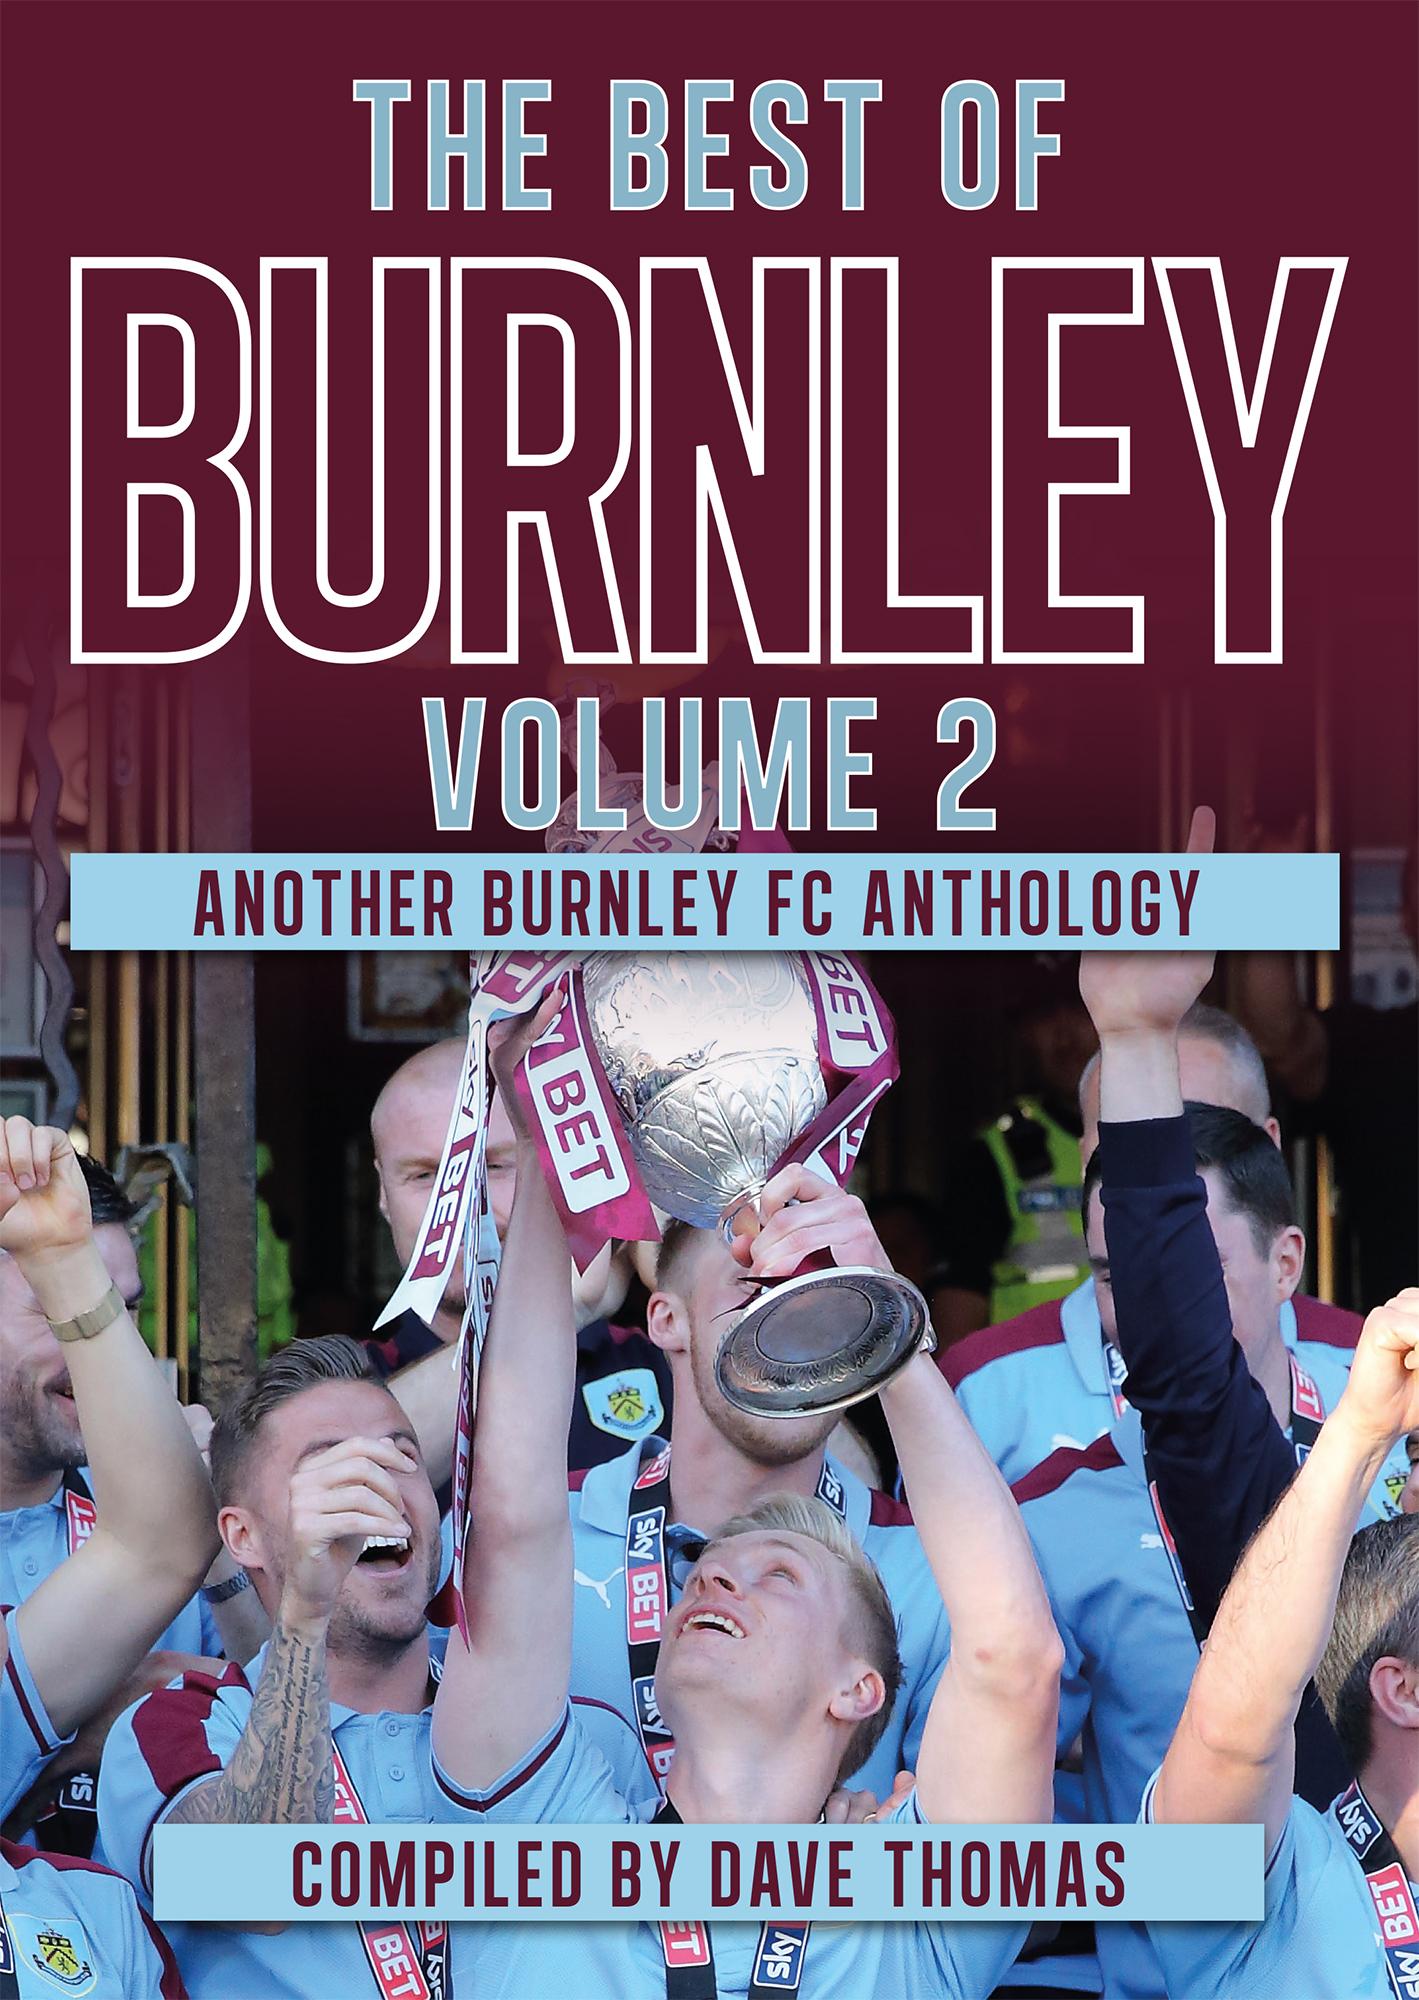 The Best of Burnley Volume 2